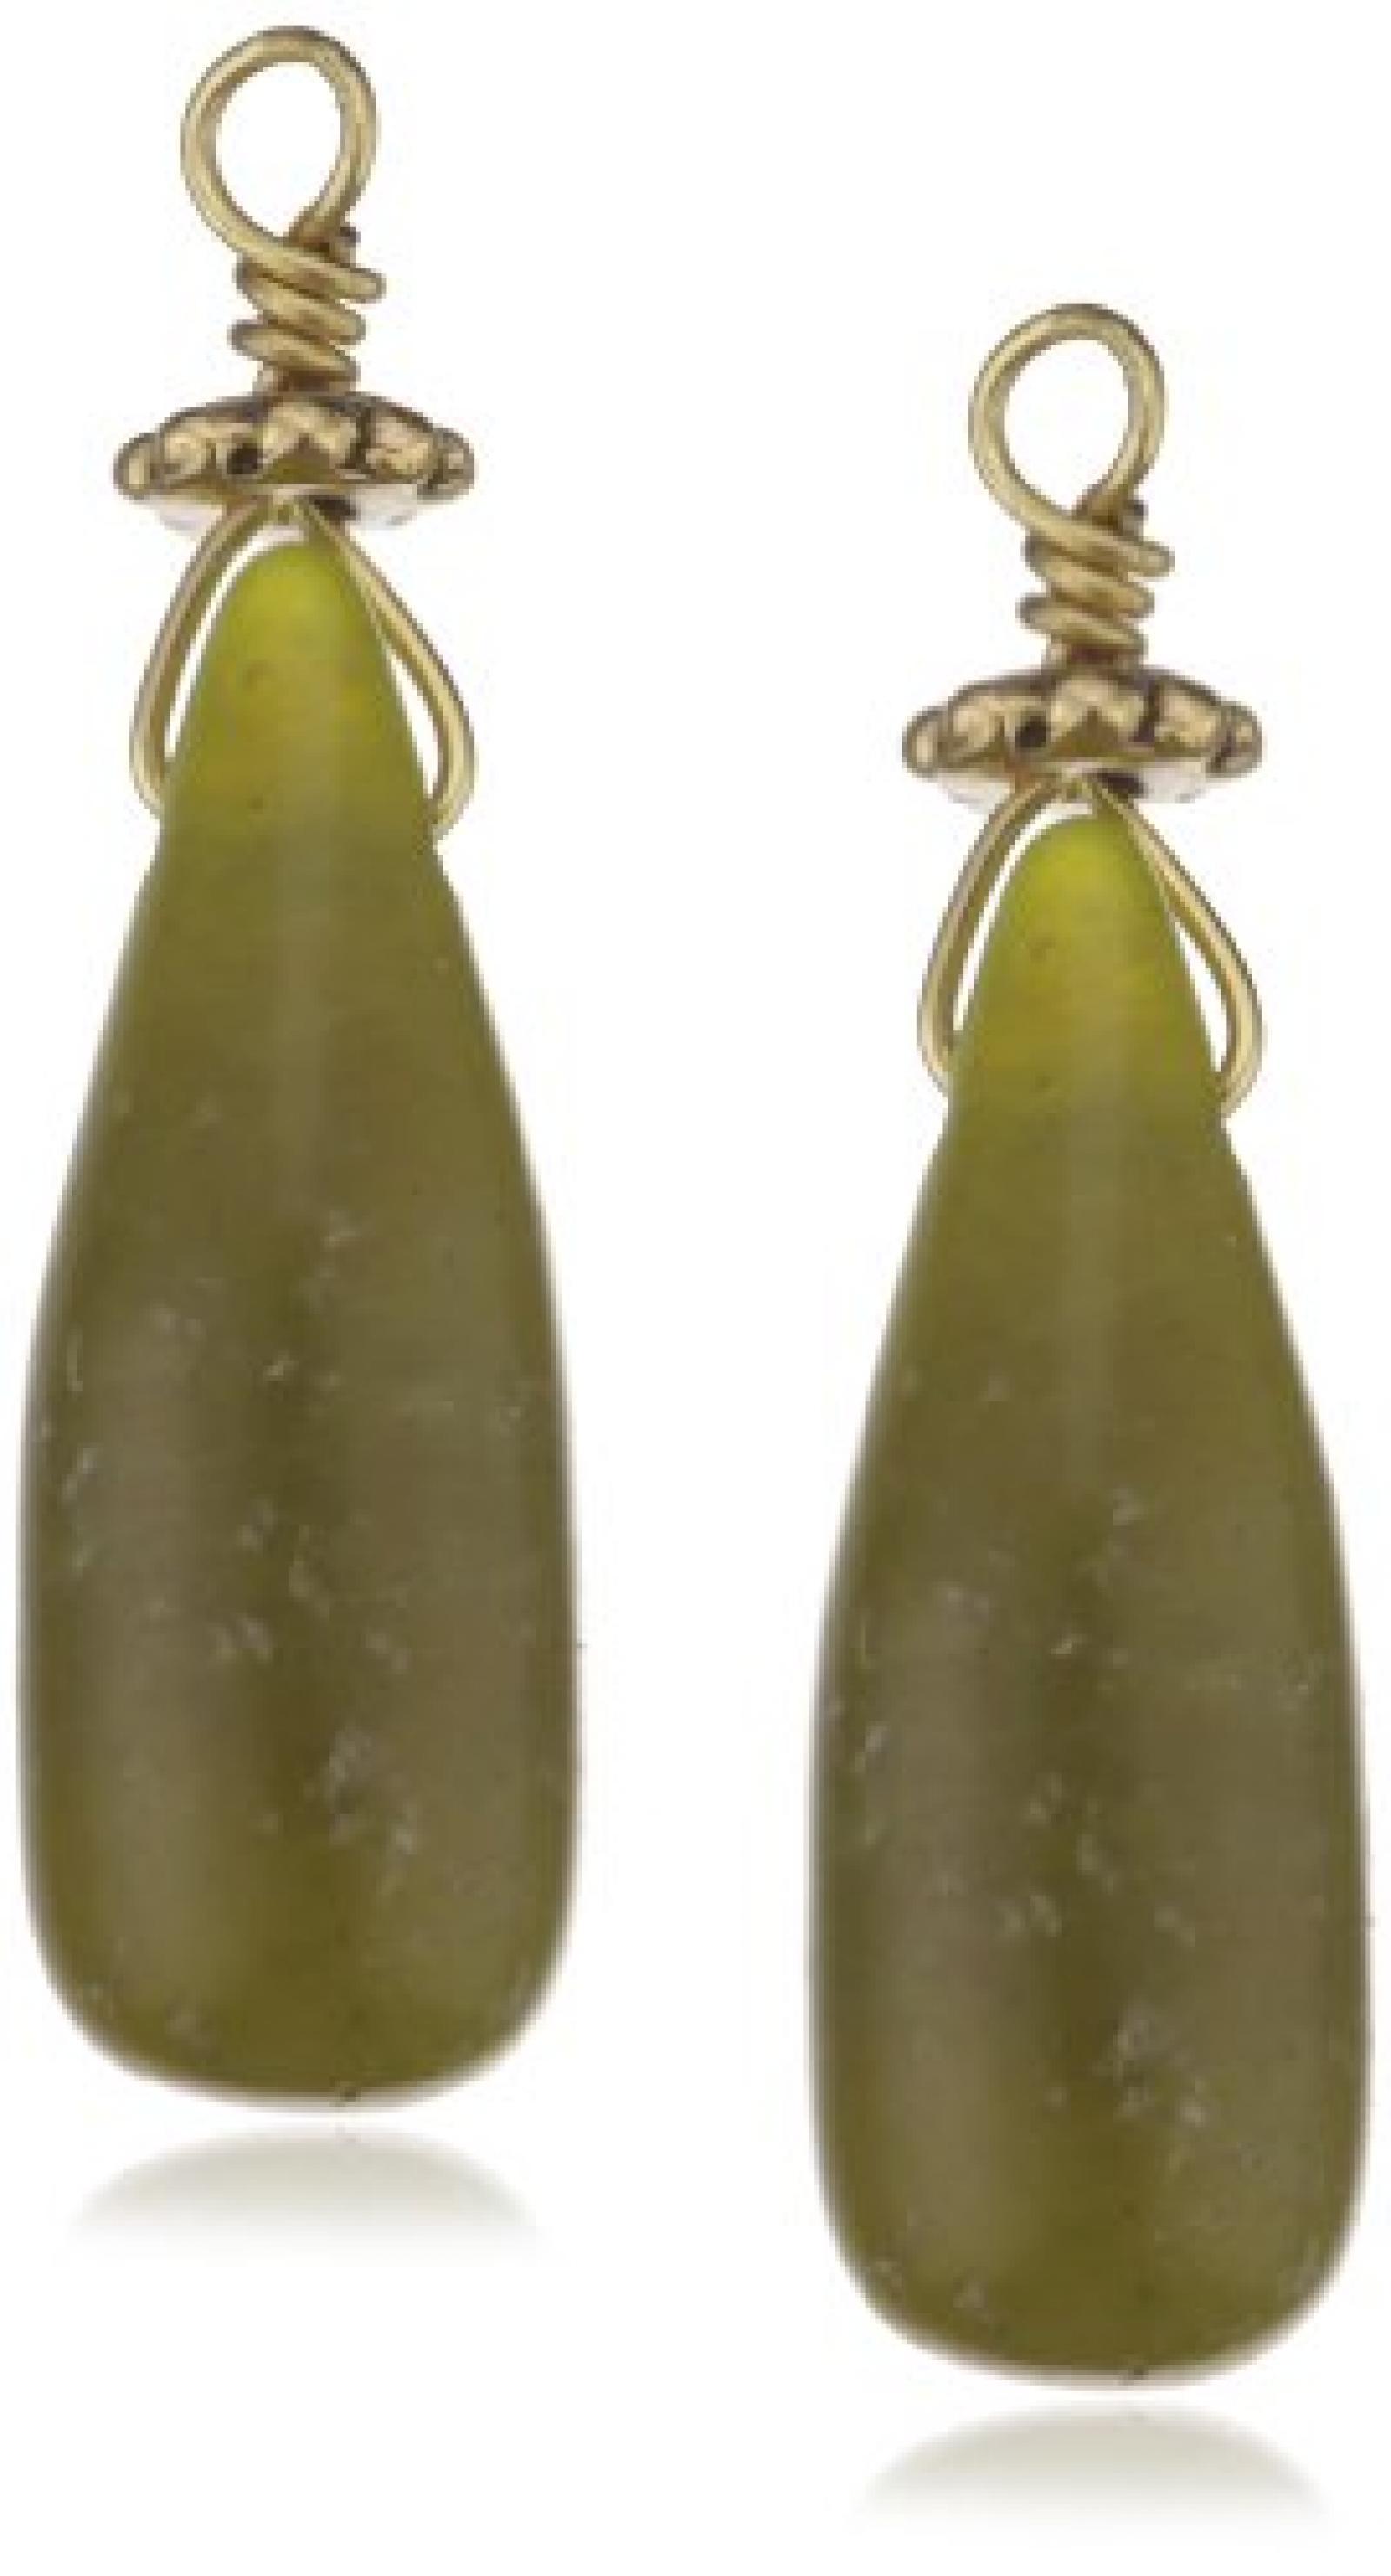 PILGRIM 511-025 Ohrring-Charms Anhänger, vergoldet, grün